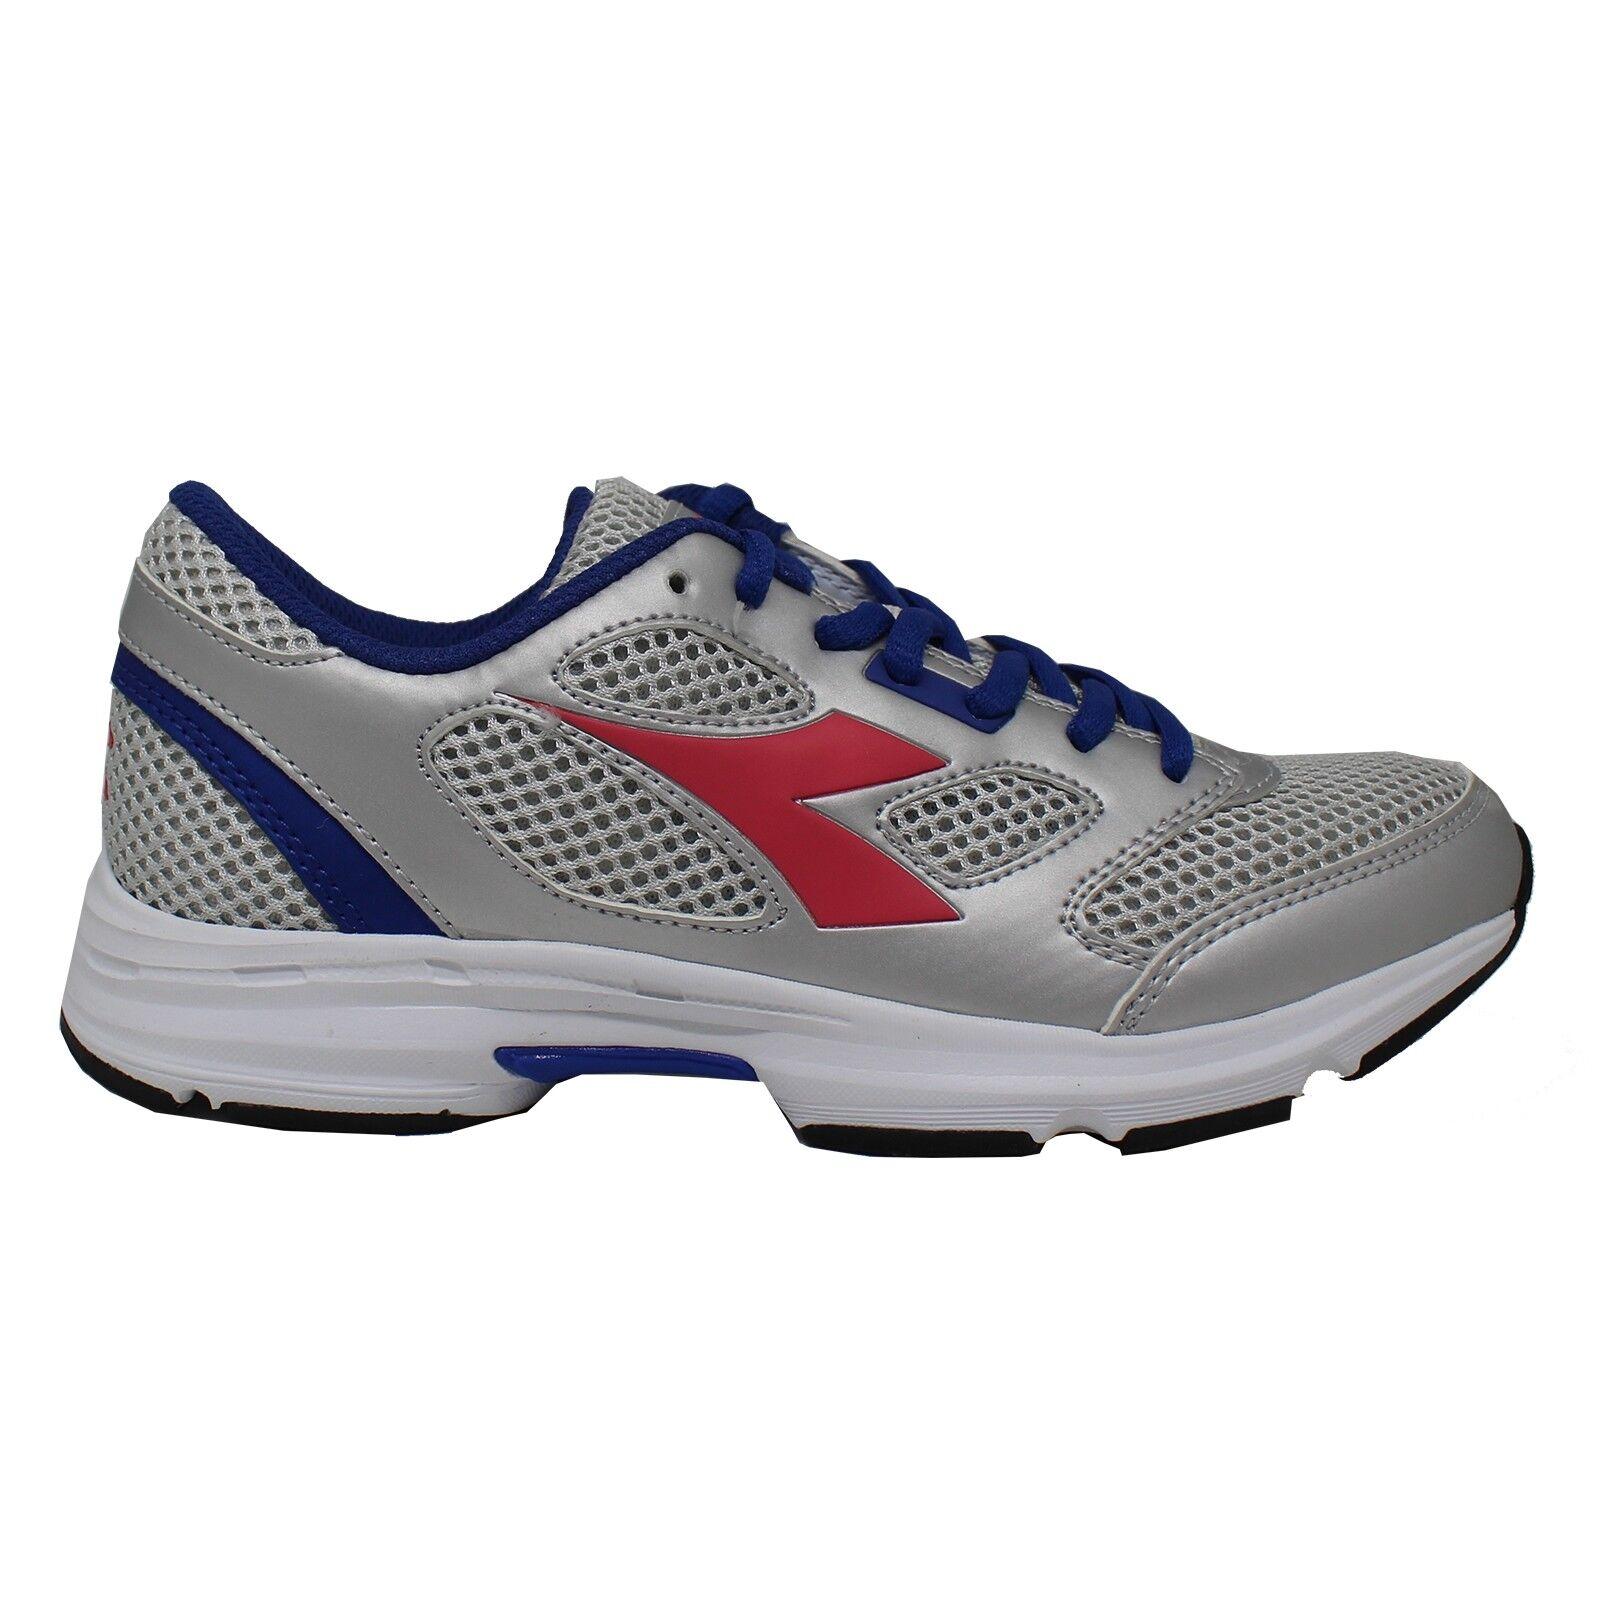 DIADORA SHAPE 7 SILVER Sports shoes Woman Running Running Jogging Sport